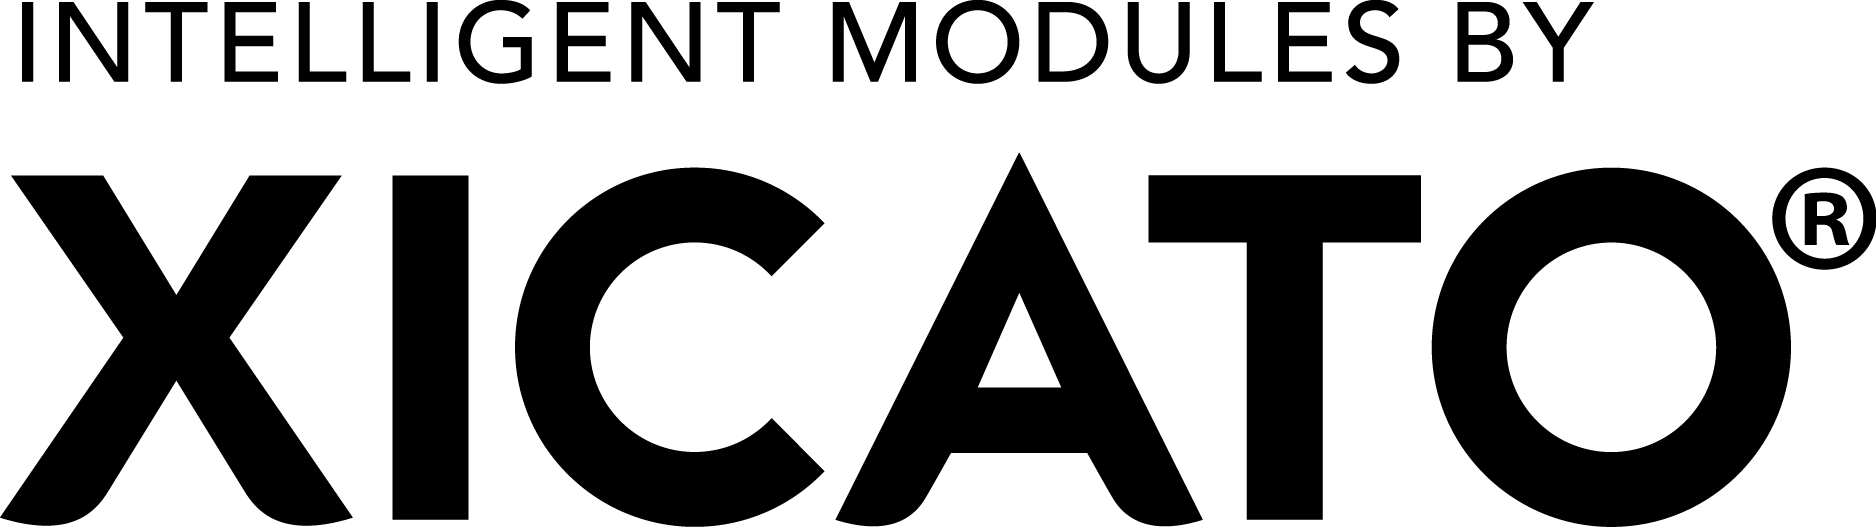 XICATO_modules.png